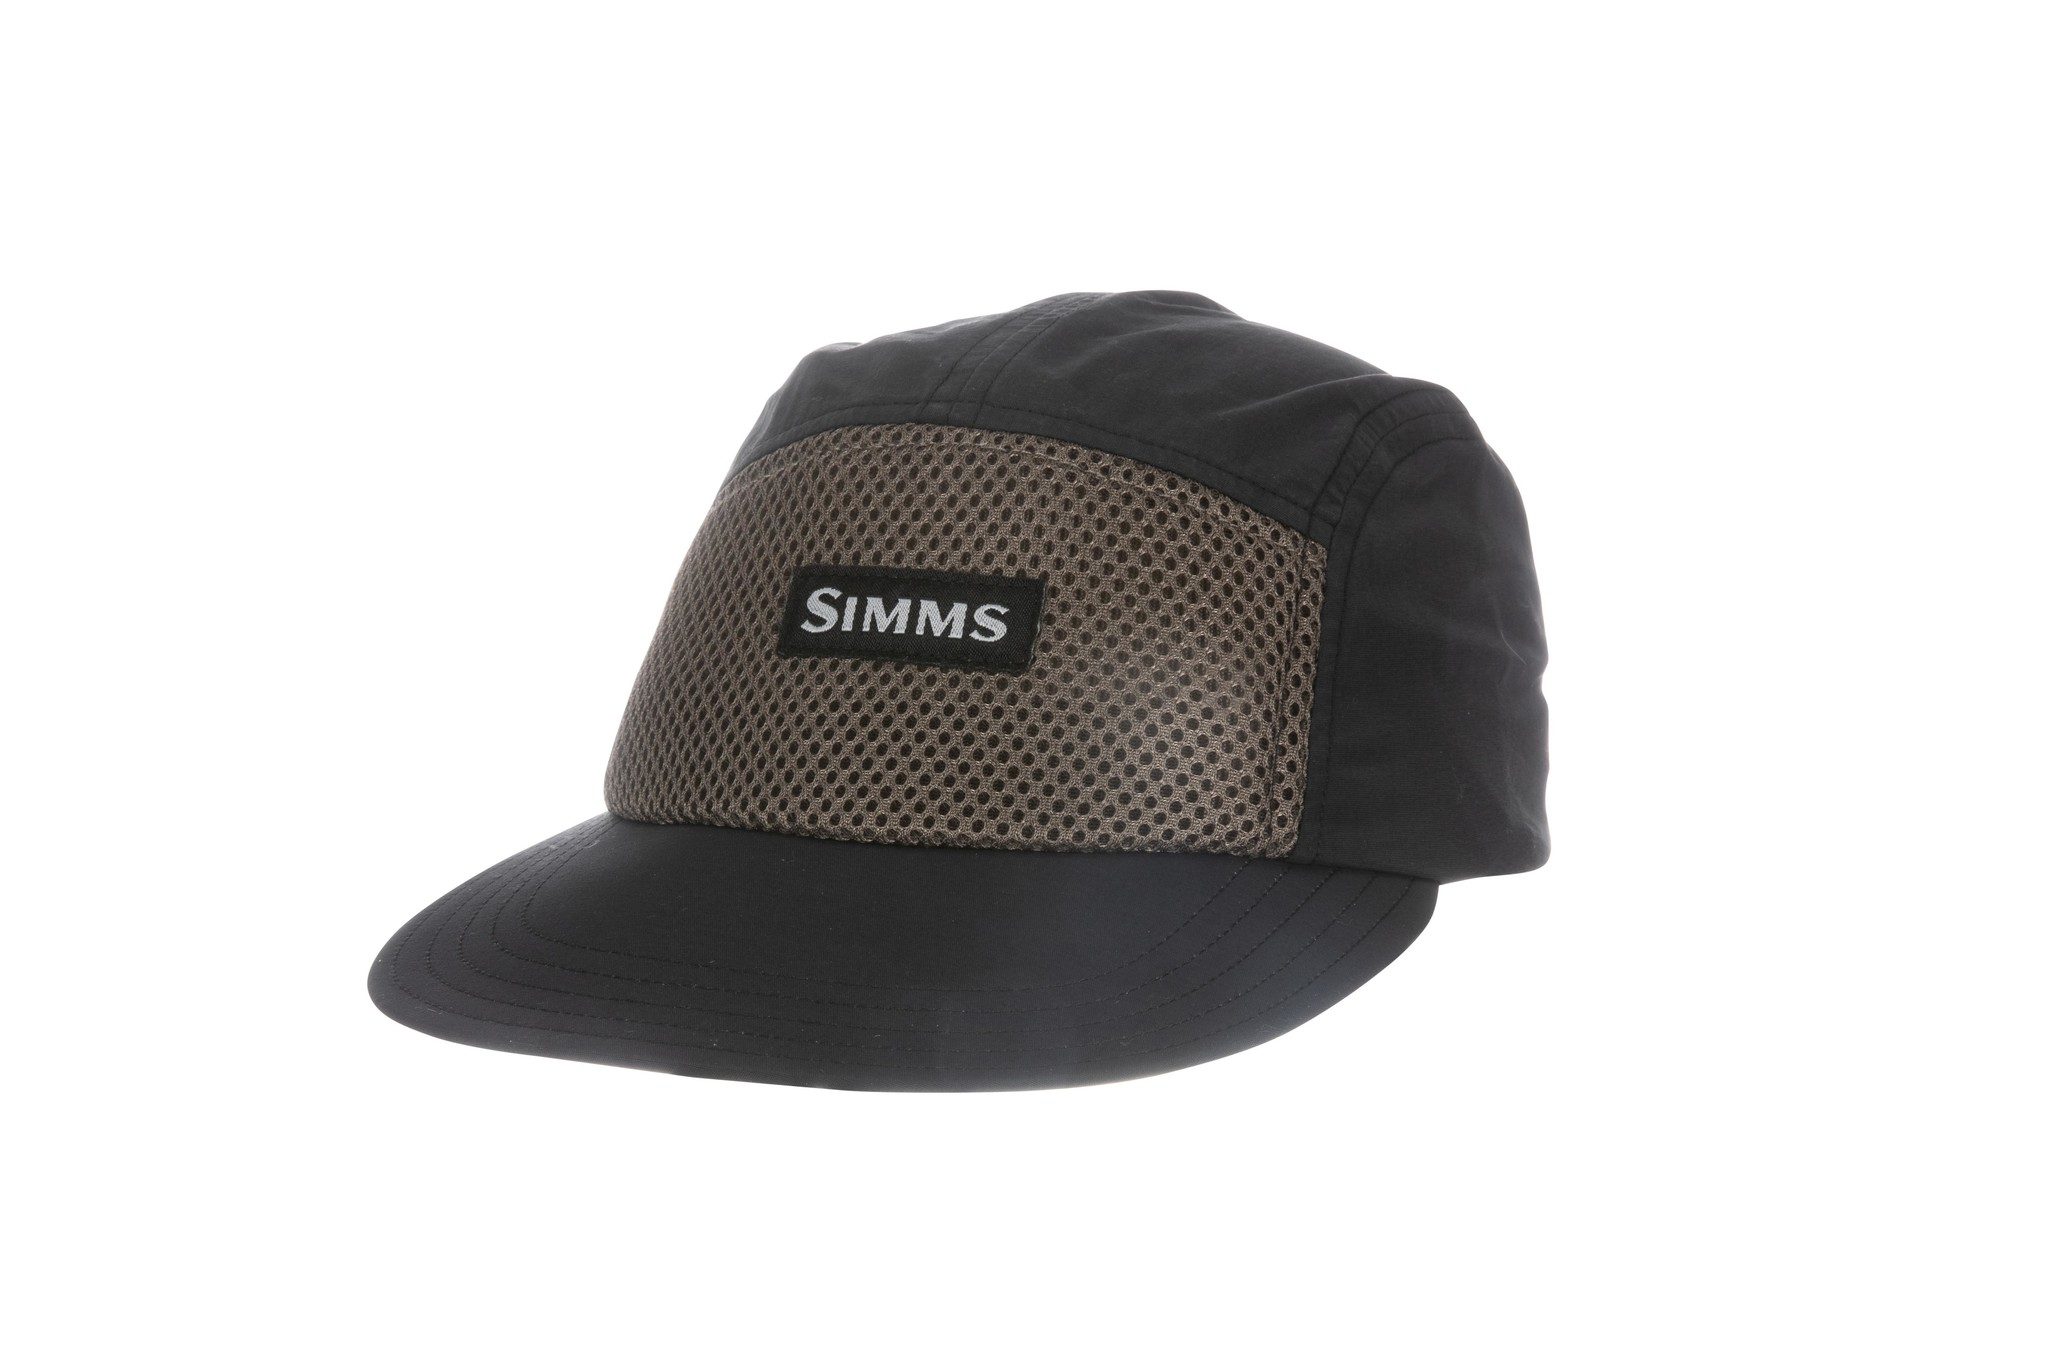 SIMMS Simms Flyweight Mesh Cap - Black